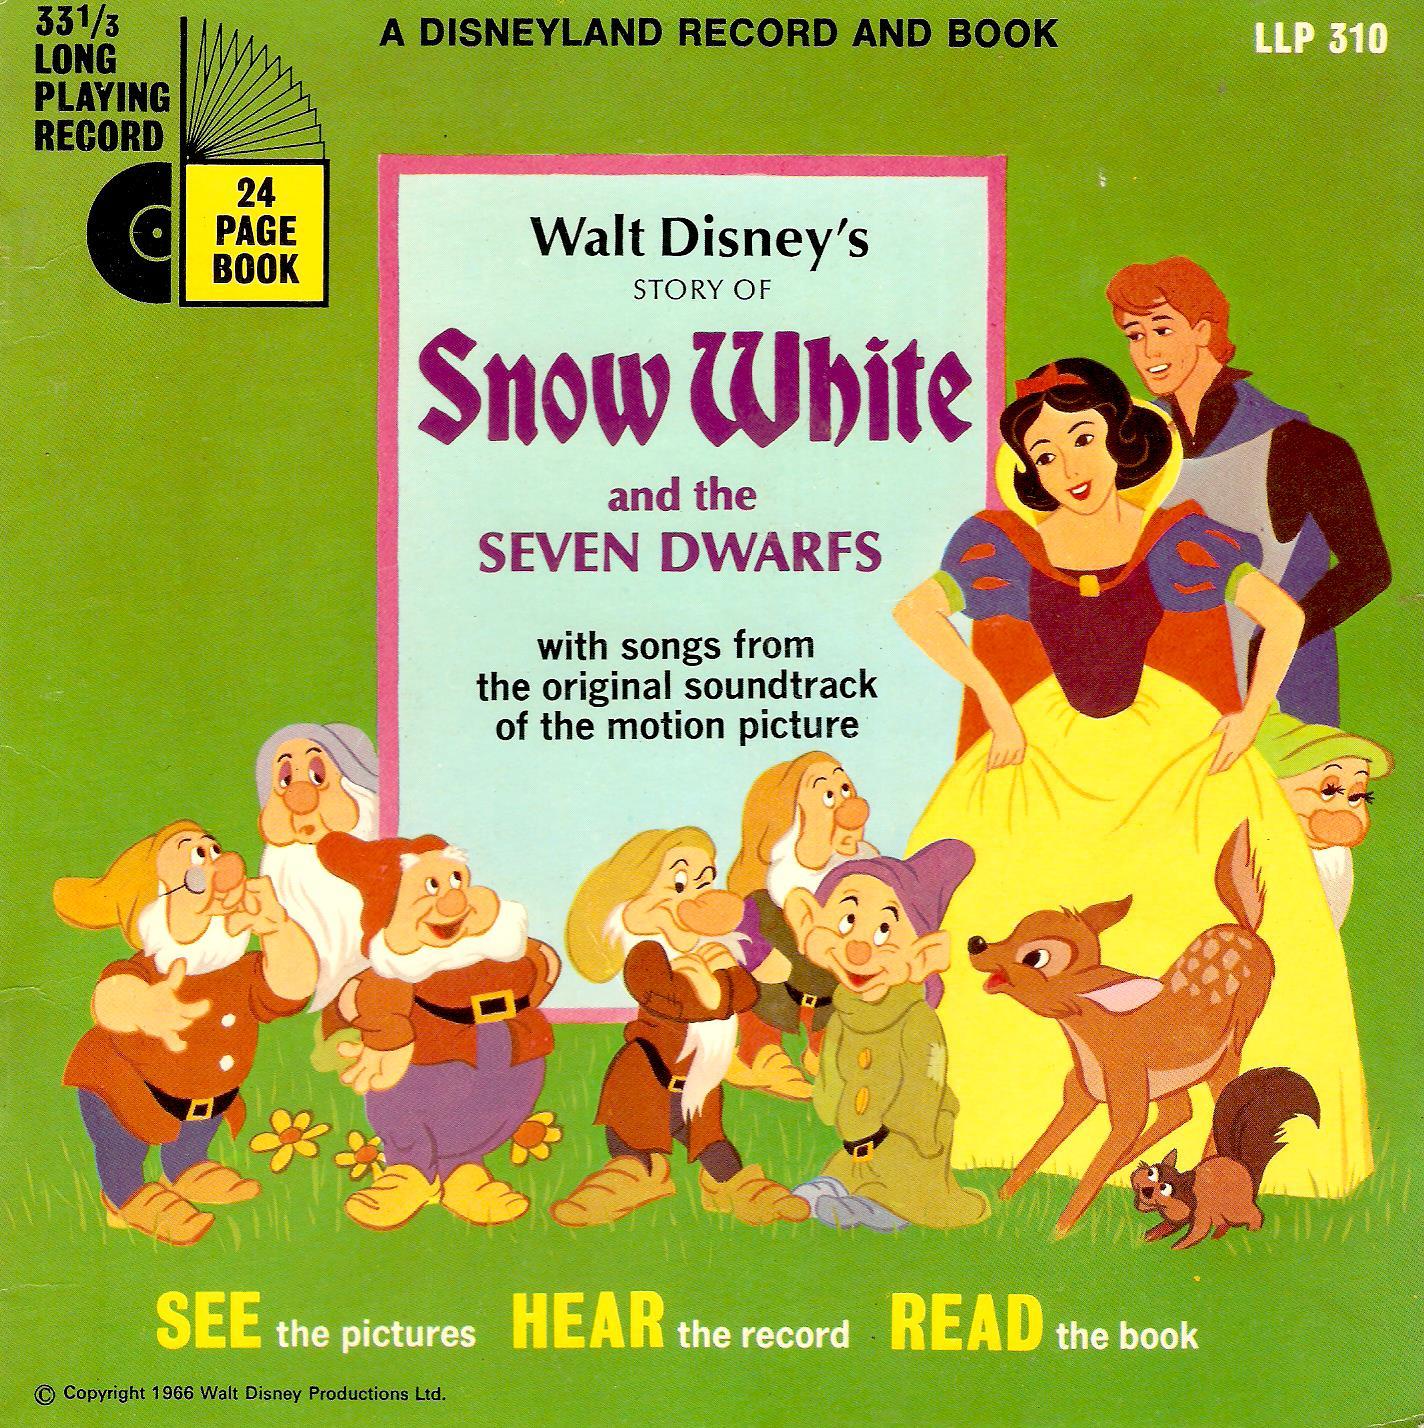 Story Of Snow White And The Seven Dwarfs Vinyl Record 7 Inch Disneyland 1969